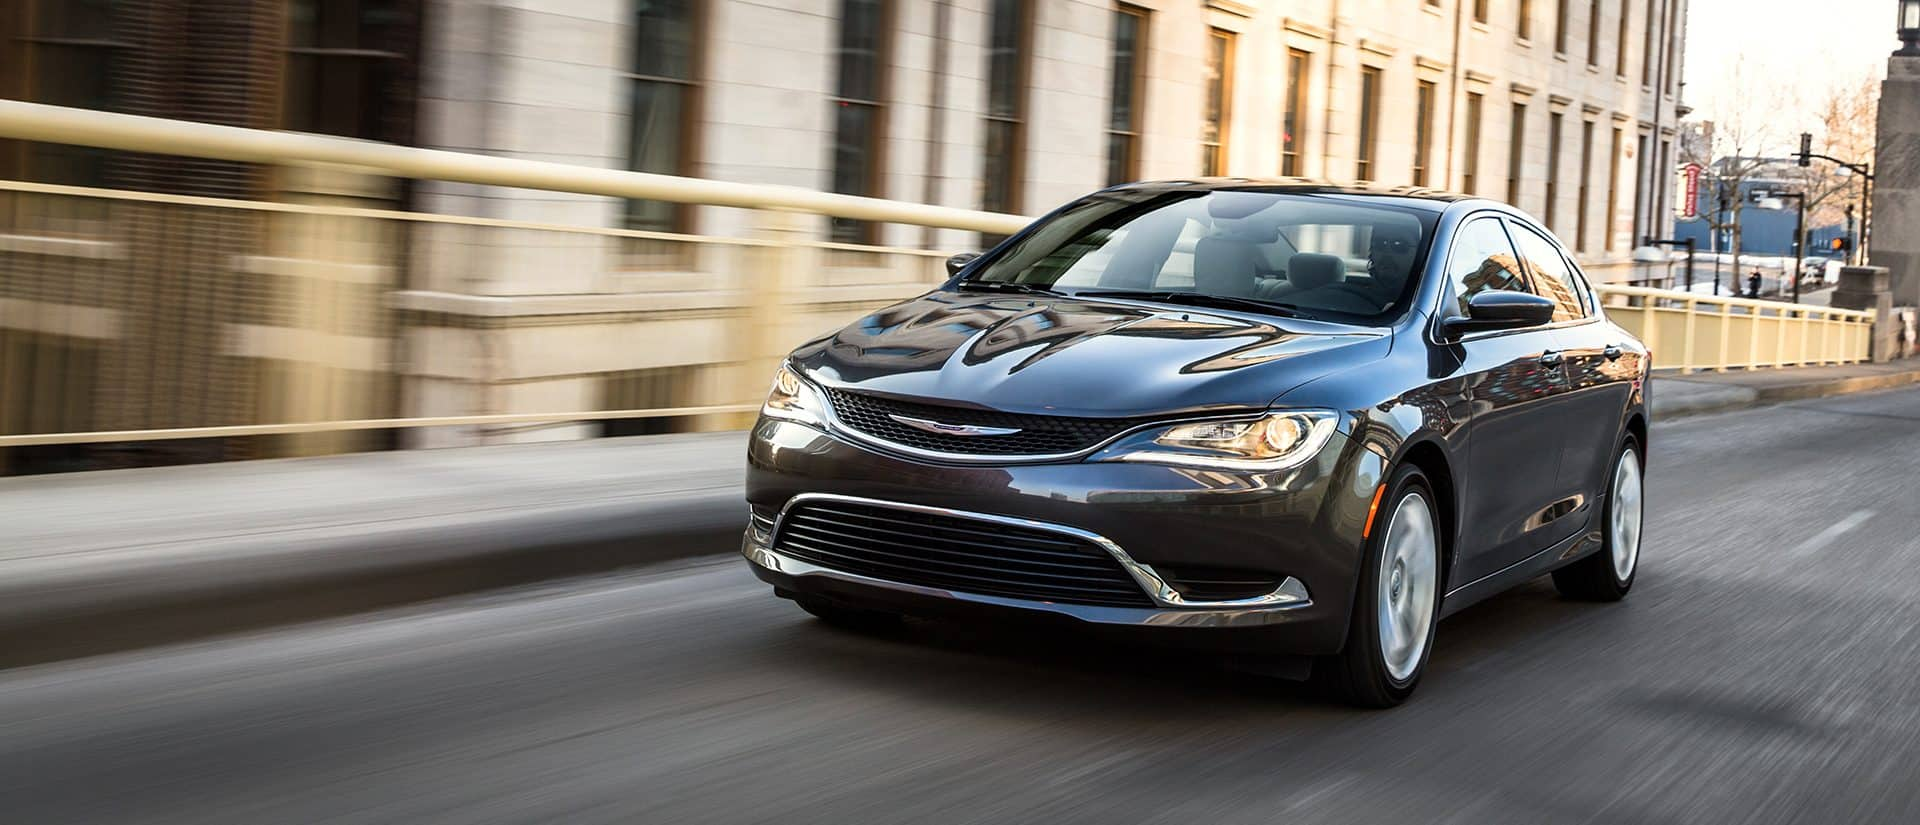 Worksheet. Chrysler Official Site  Cars and Minivans